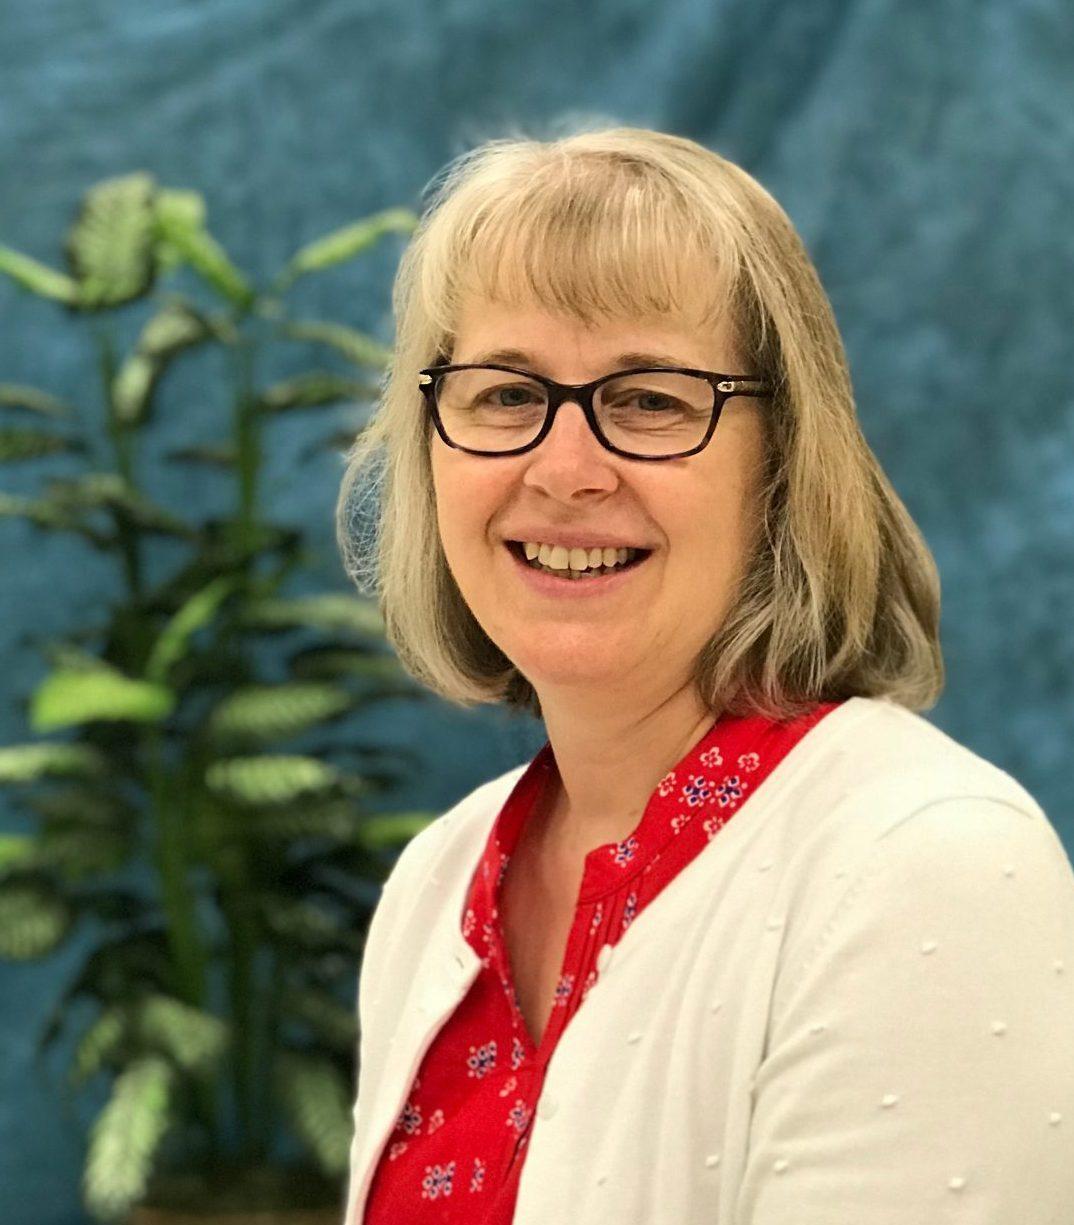 image of Karen Stein